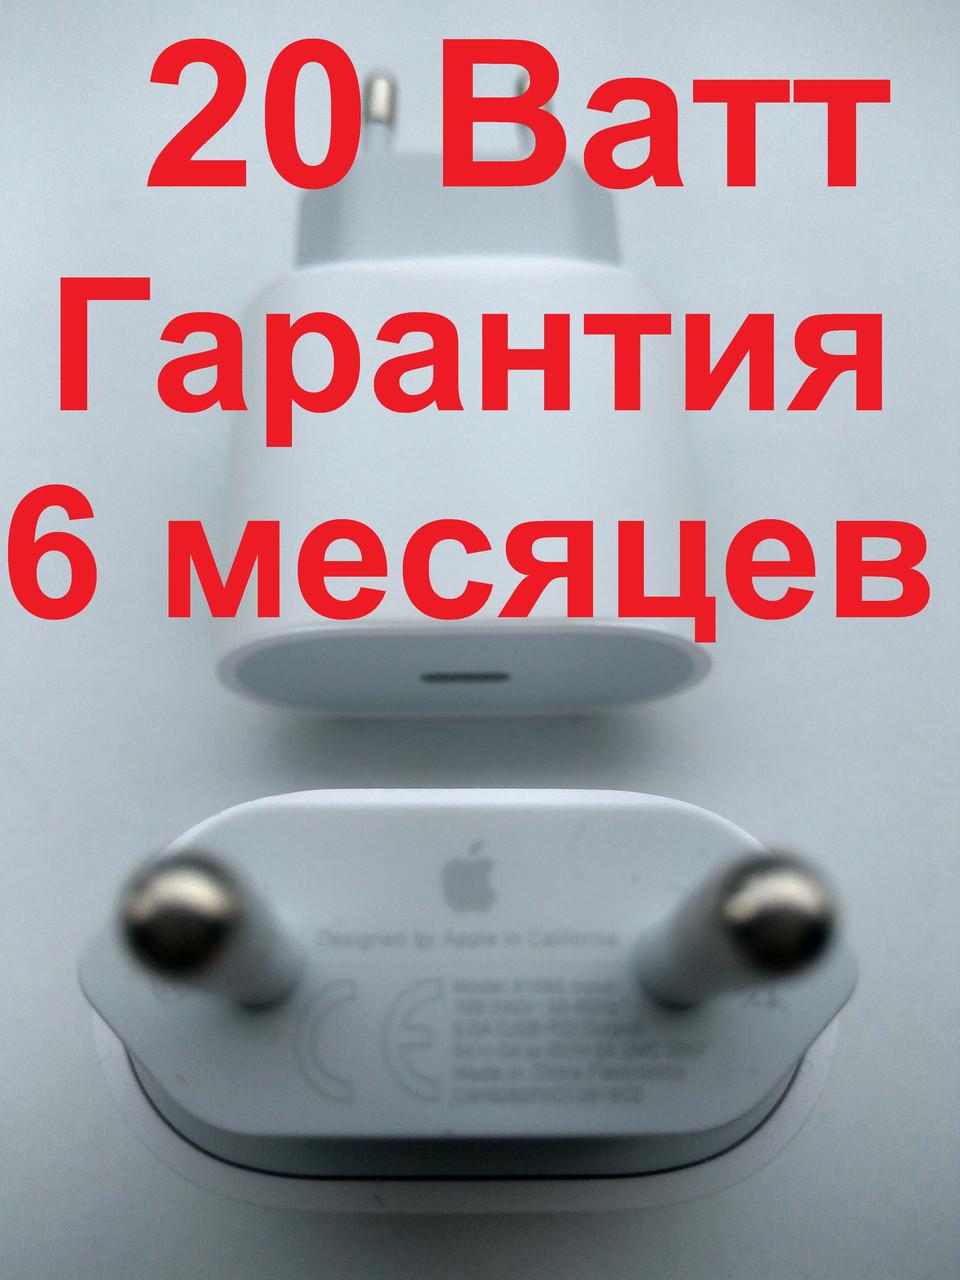 Блок питания Apple 20W USB-C Power Adapter Адаптер питания мощностью 20 Вт для iPhone12 Айфон 11Pro Max